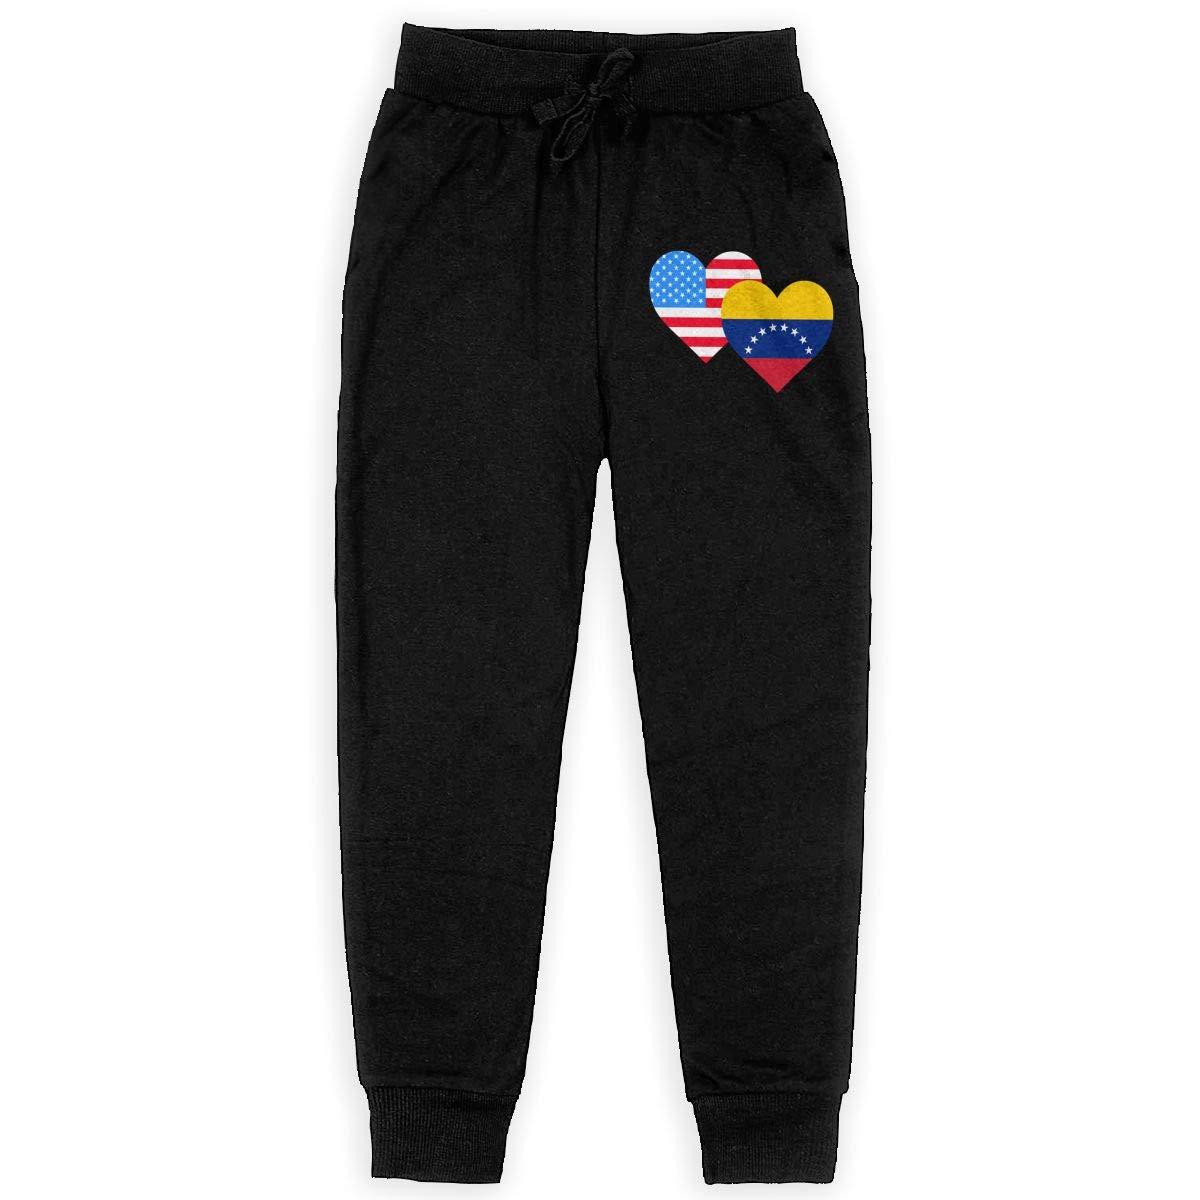 Girls Jogger Pants for Teenager Girls WYZVK22 American Venezuela Hraet Flag-1 Soft//Cozy Sweatpants